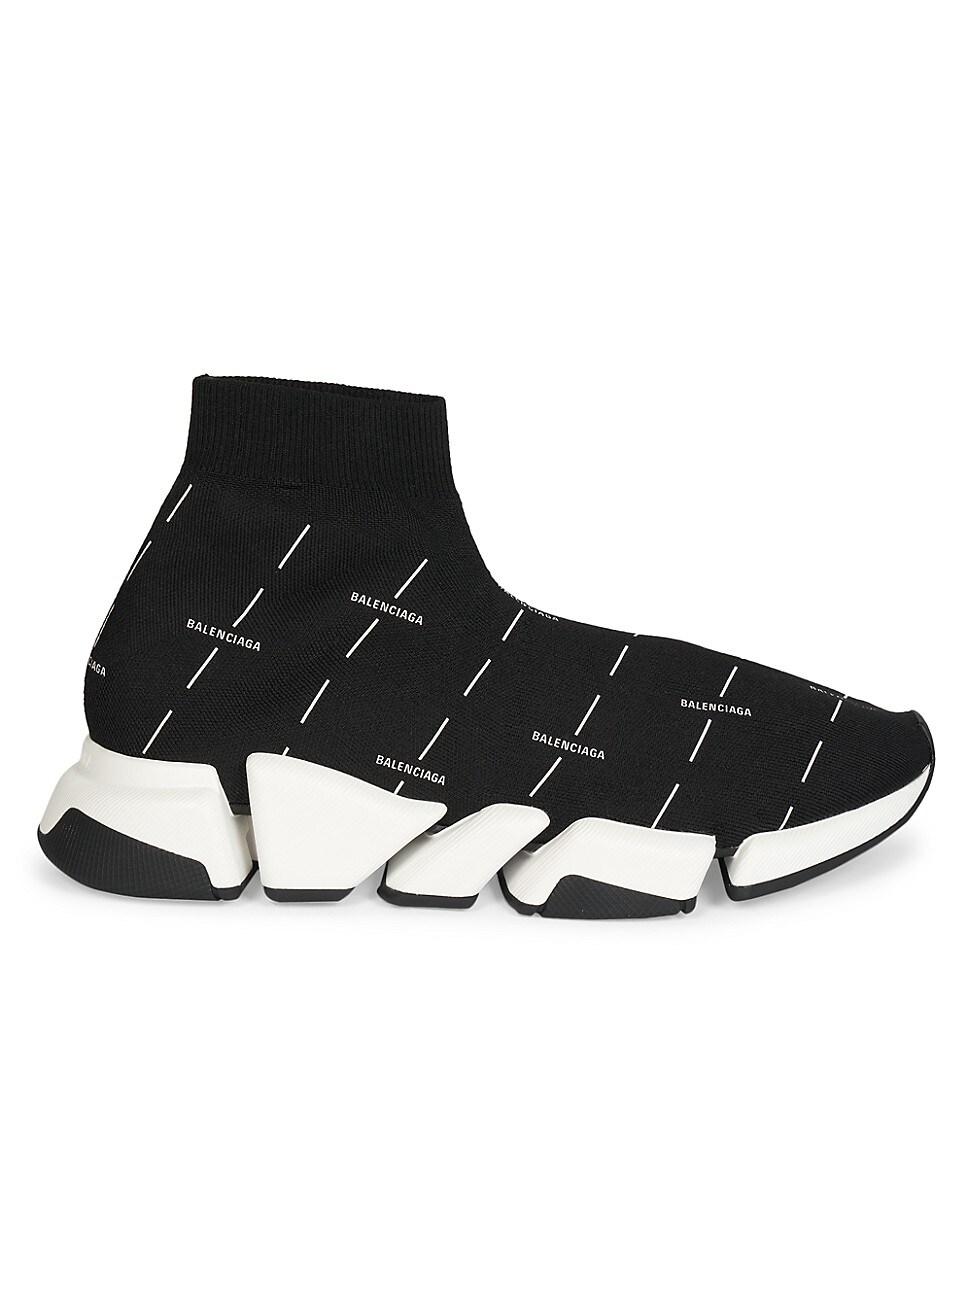 Balenciaga MEN'S SPEED 2.0 LT SOCK SNEAKERS